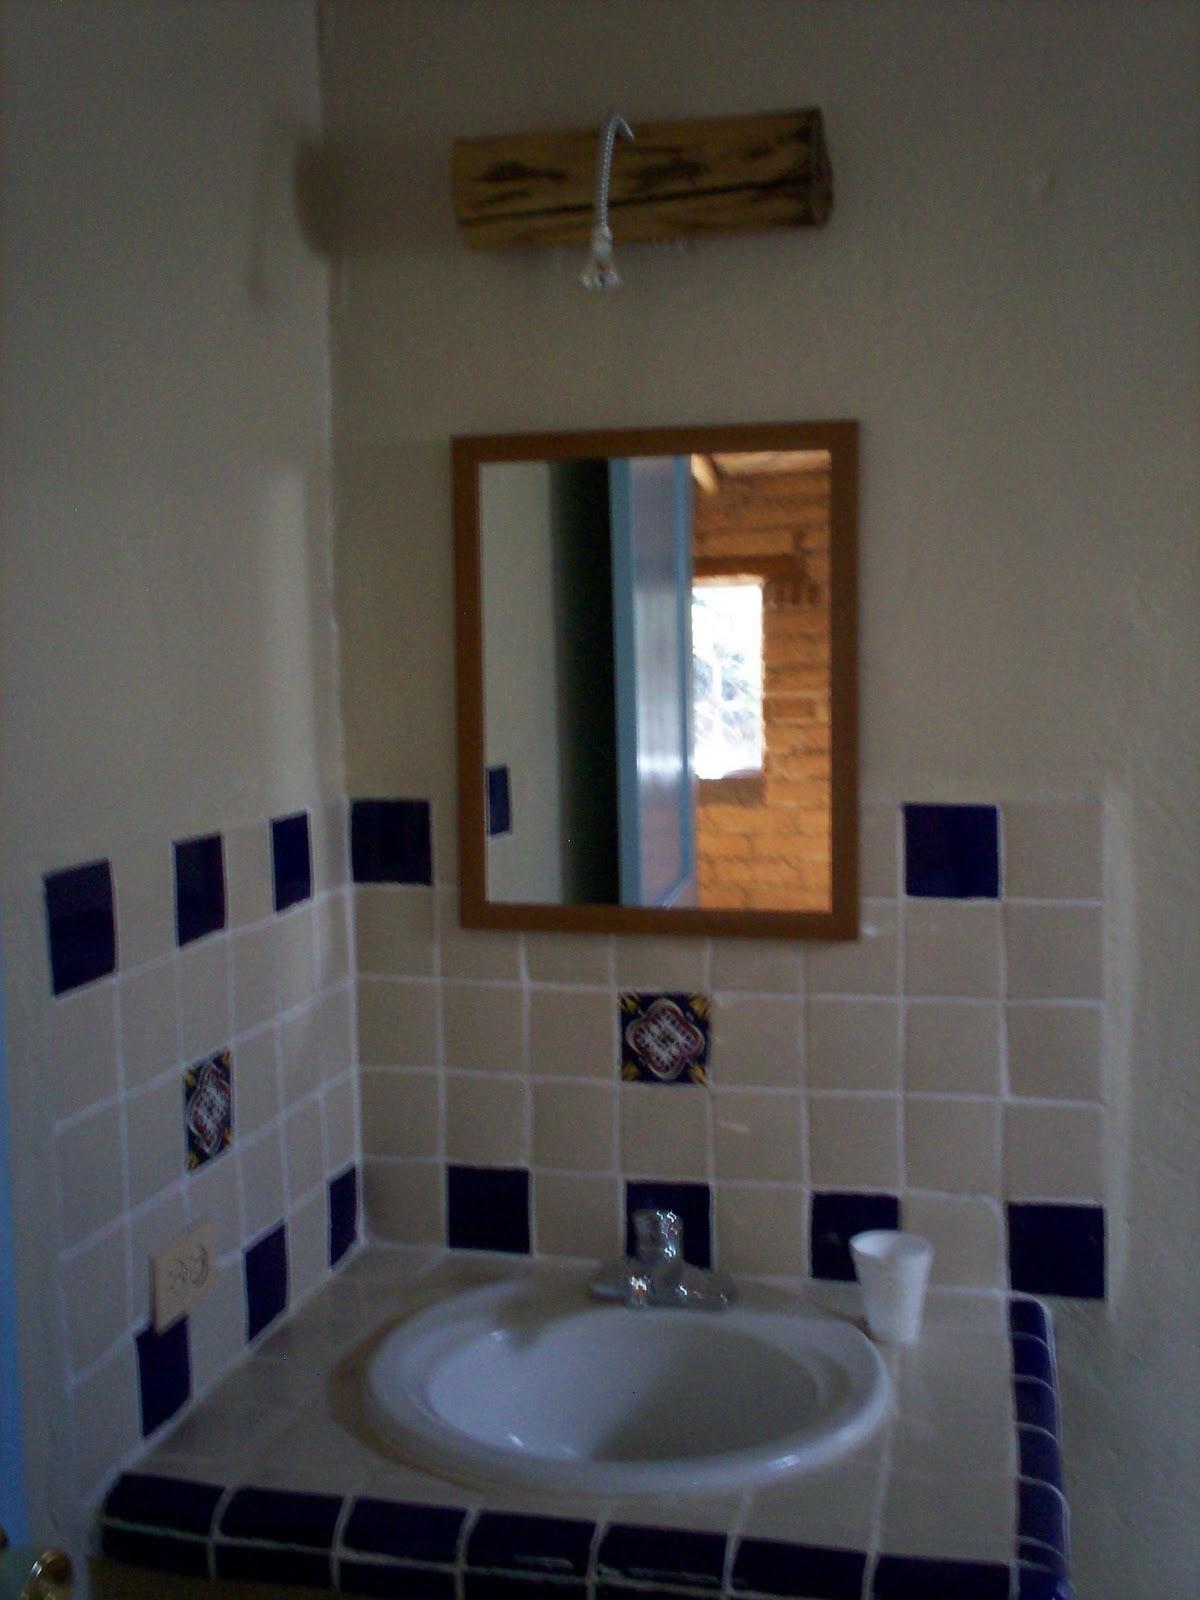 Caba as en adobe artesanal caba as en adobe artesanal for Azulejos para lavabos